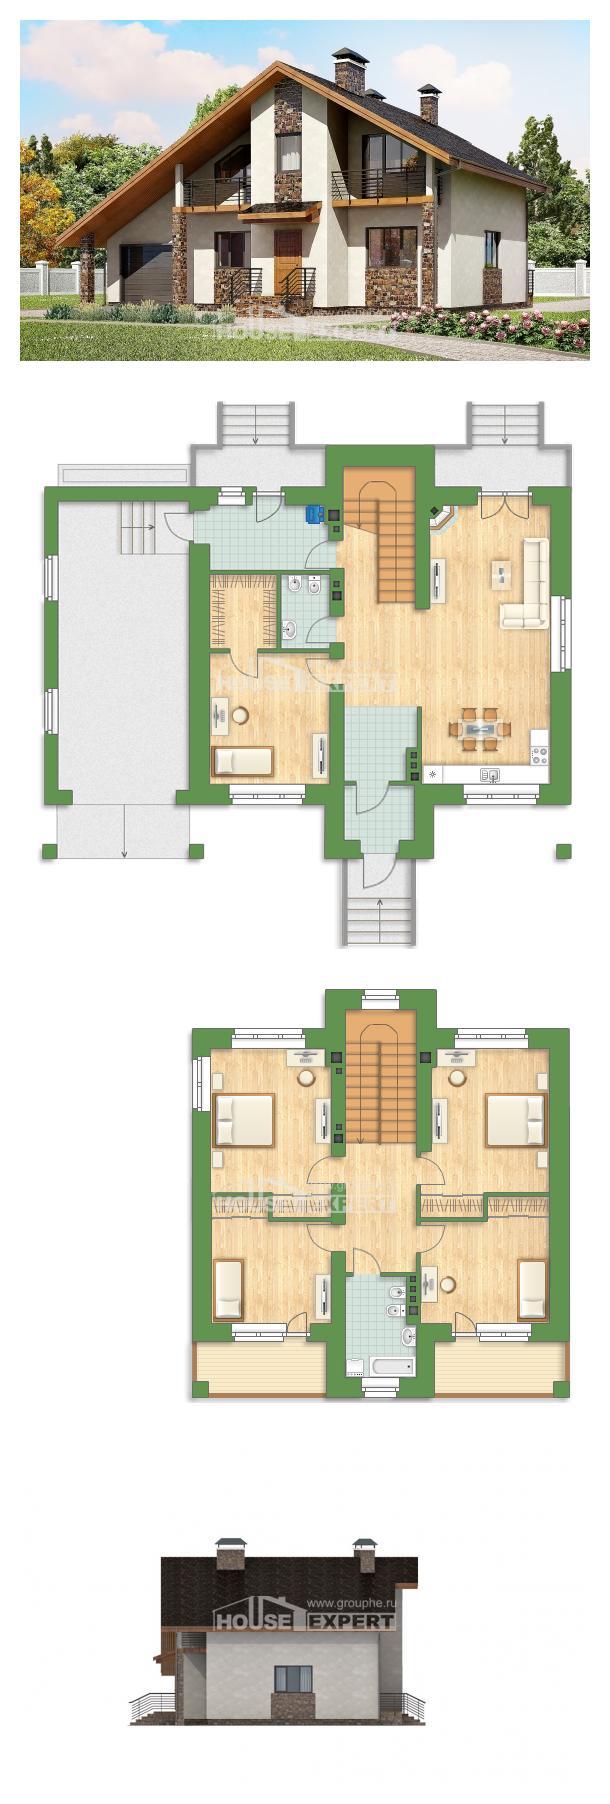 Проект дома 180-008-Л   House Expert